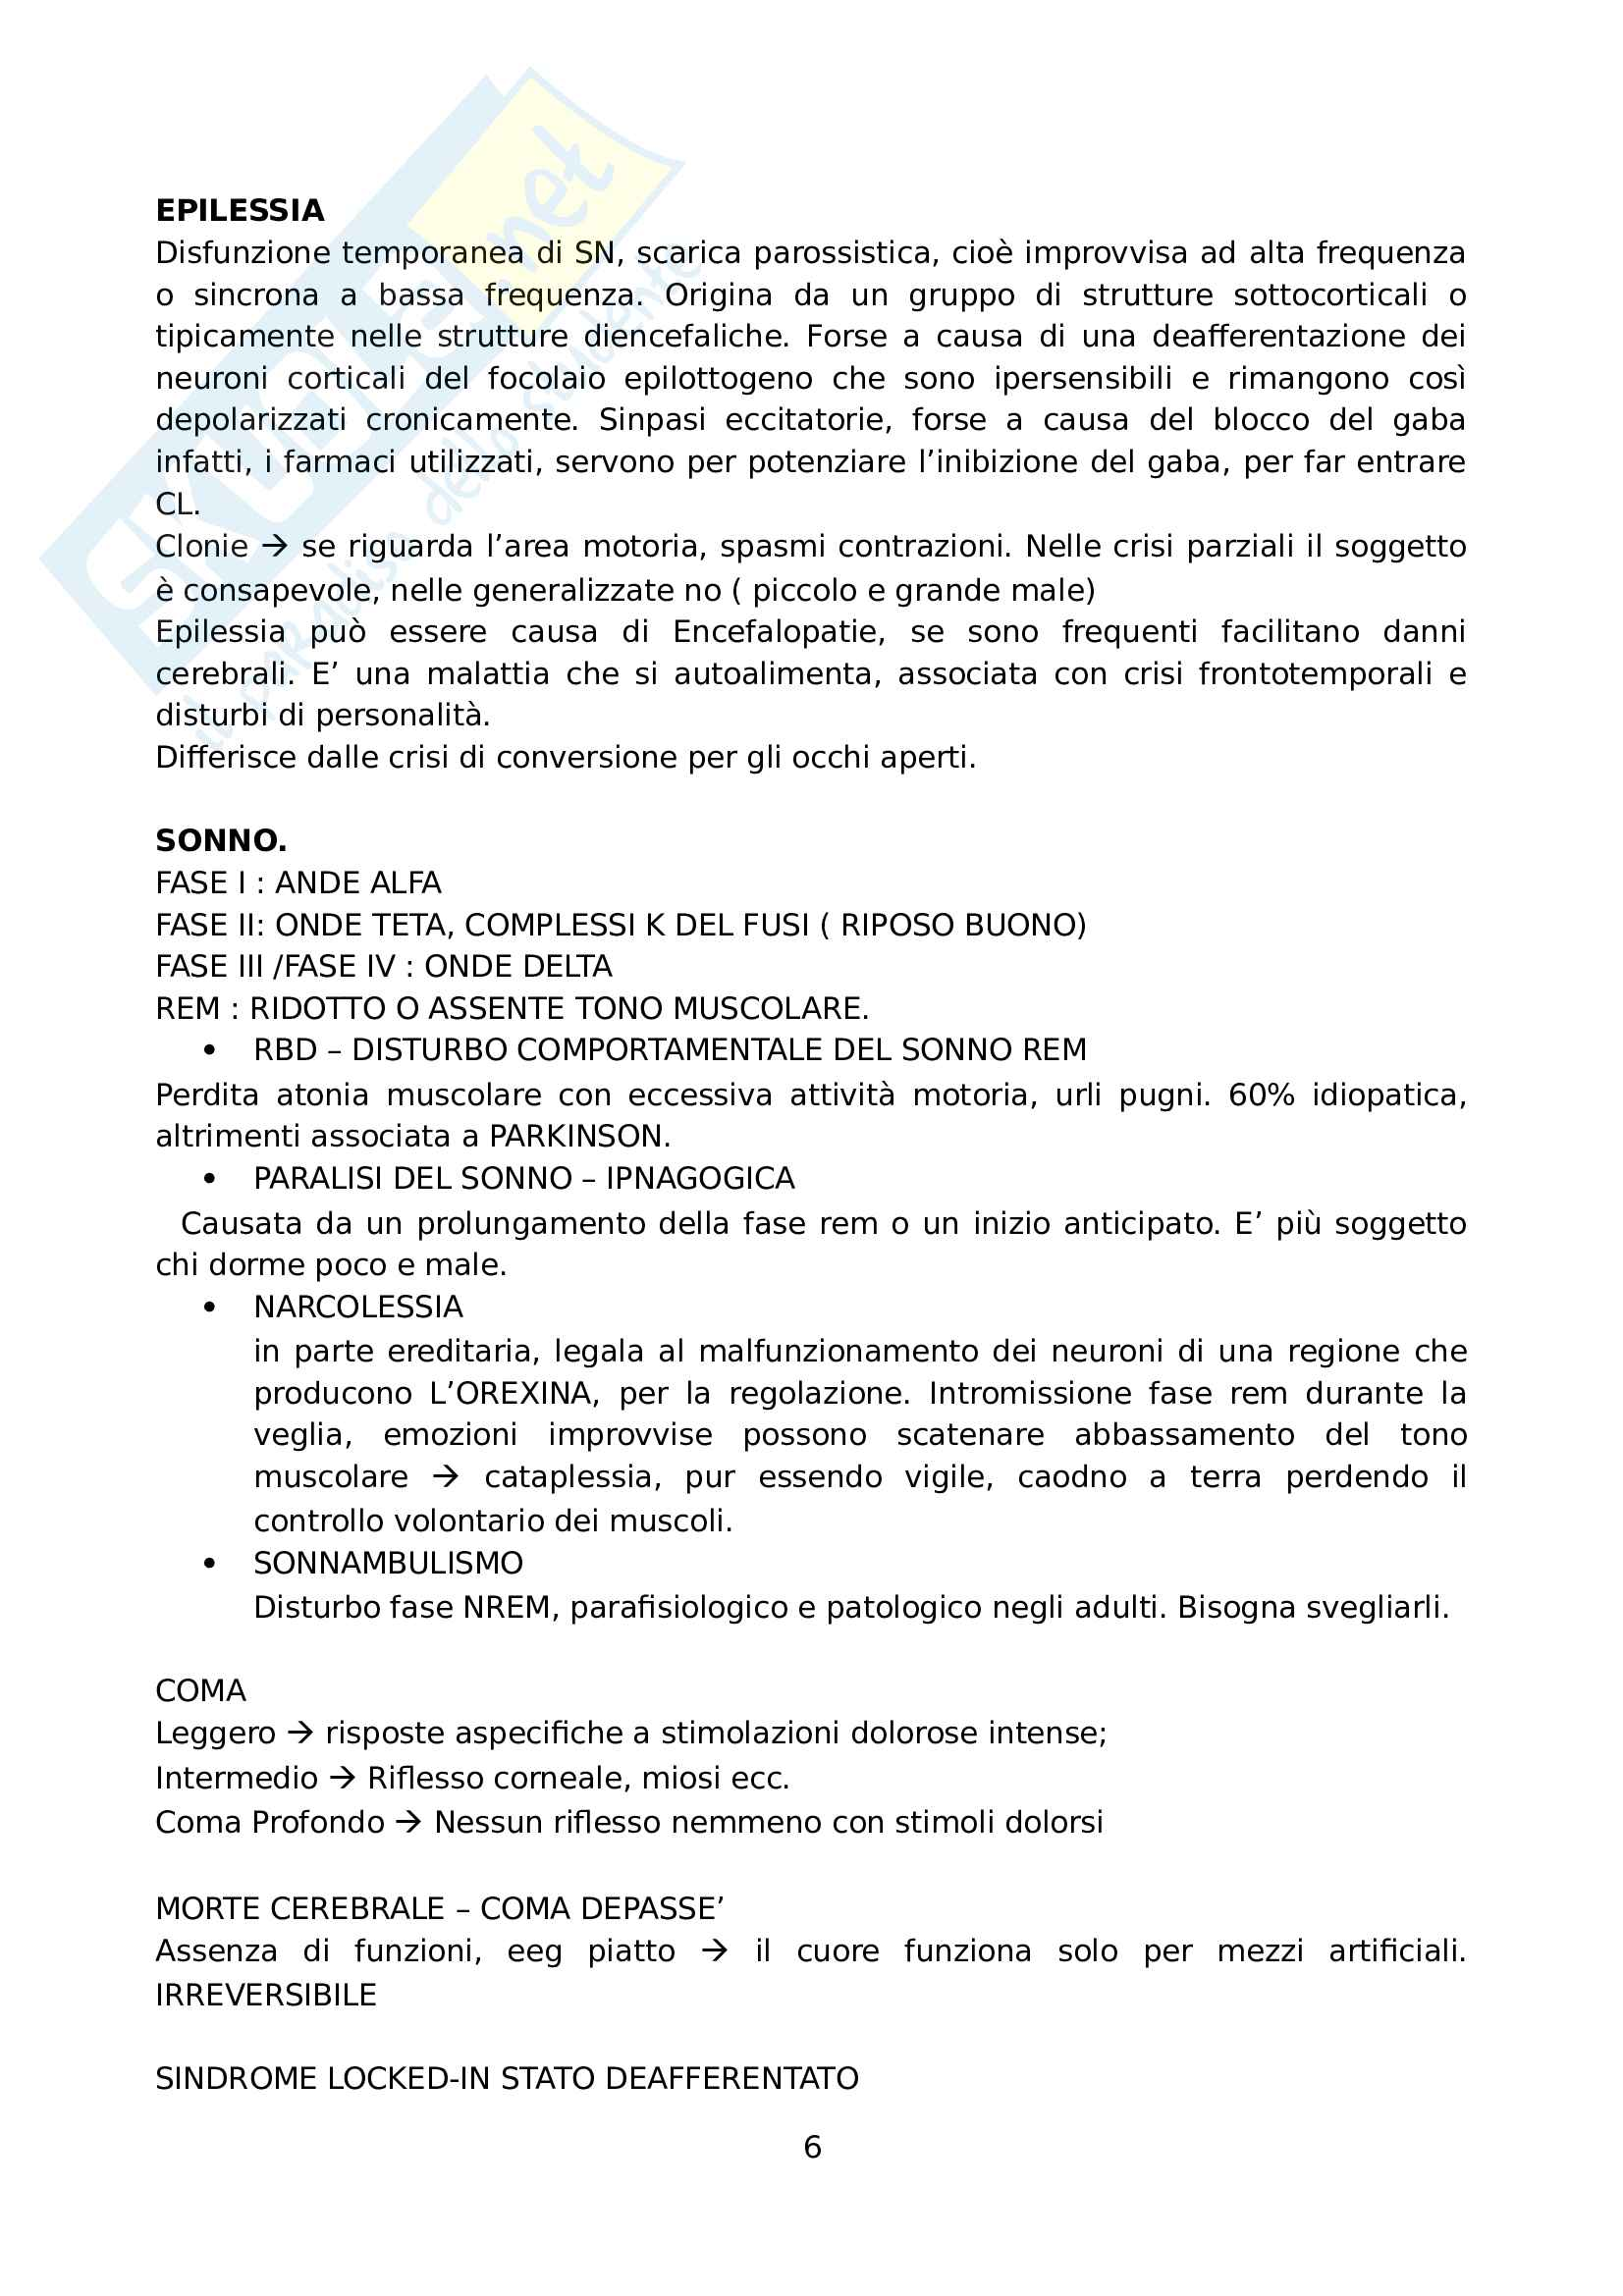 Elementi di Neurologia e Neuroriabilitazione - Riassunto schema Pag. 6